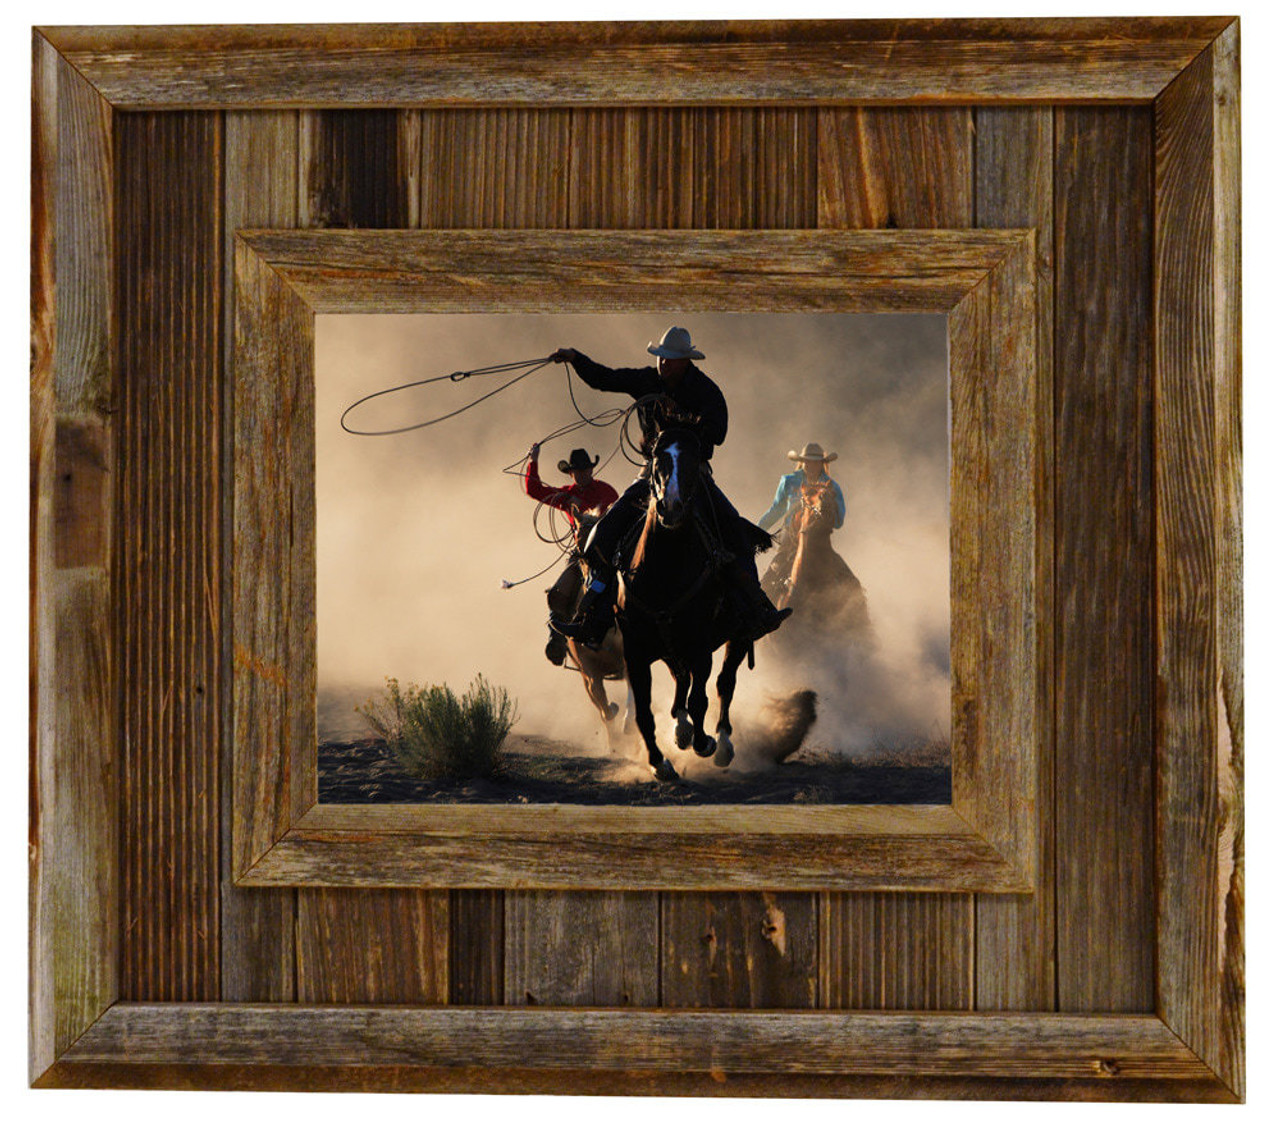 Barnwood Frames | Durango 11x14 Reclaimed Wood